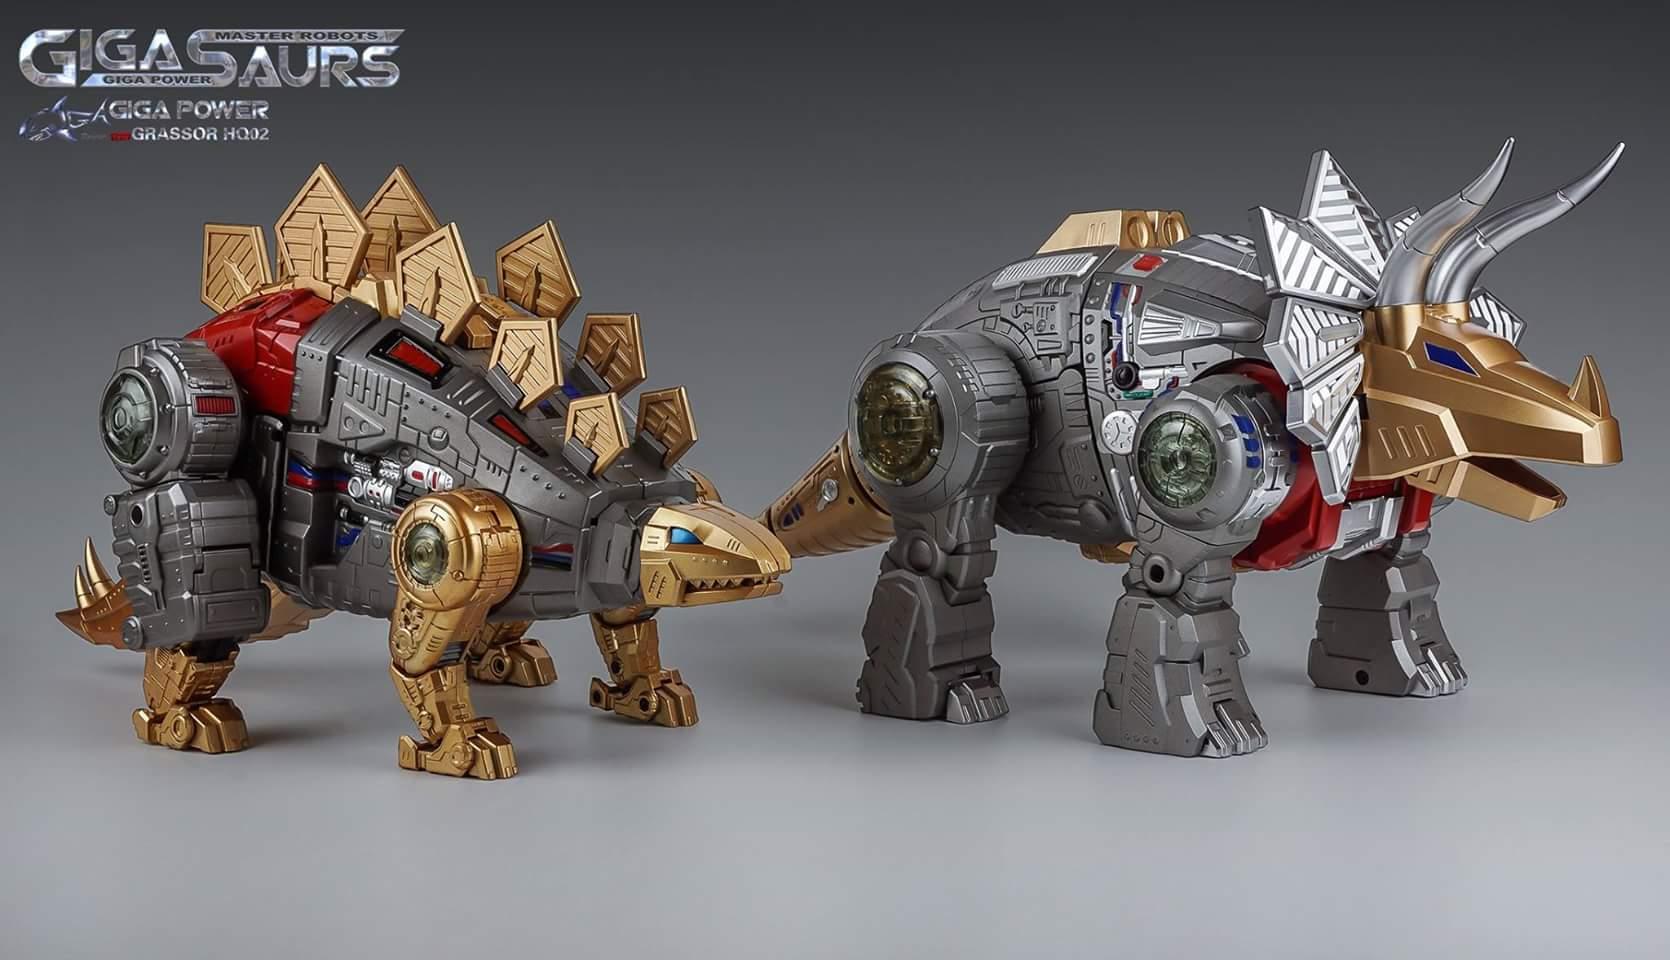 [GigaPower] Produit Tiers - Jouets HQ-01 Superator + HQ-02 Grassor + HQ-03 Guttur + HQ-04 Graviter + HQ-05 Gaudenter - aka Dinobots - Page 5 CyxRRyKp